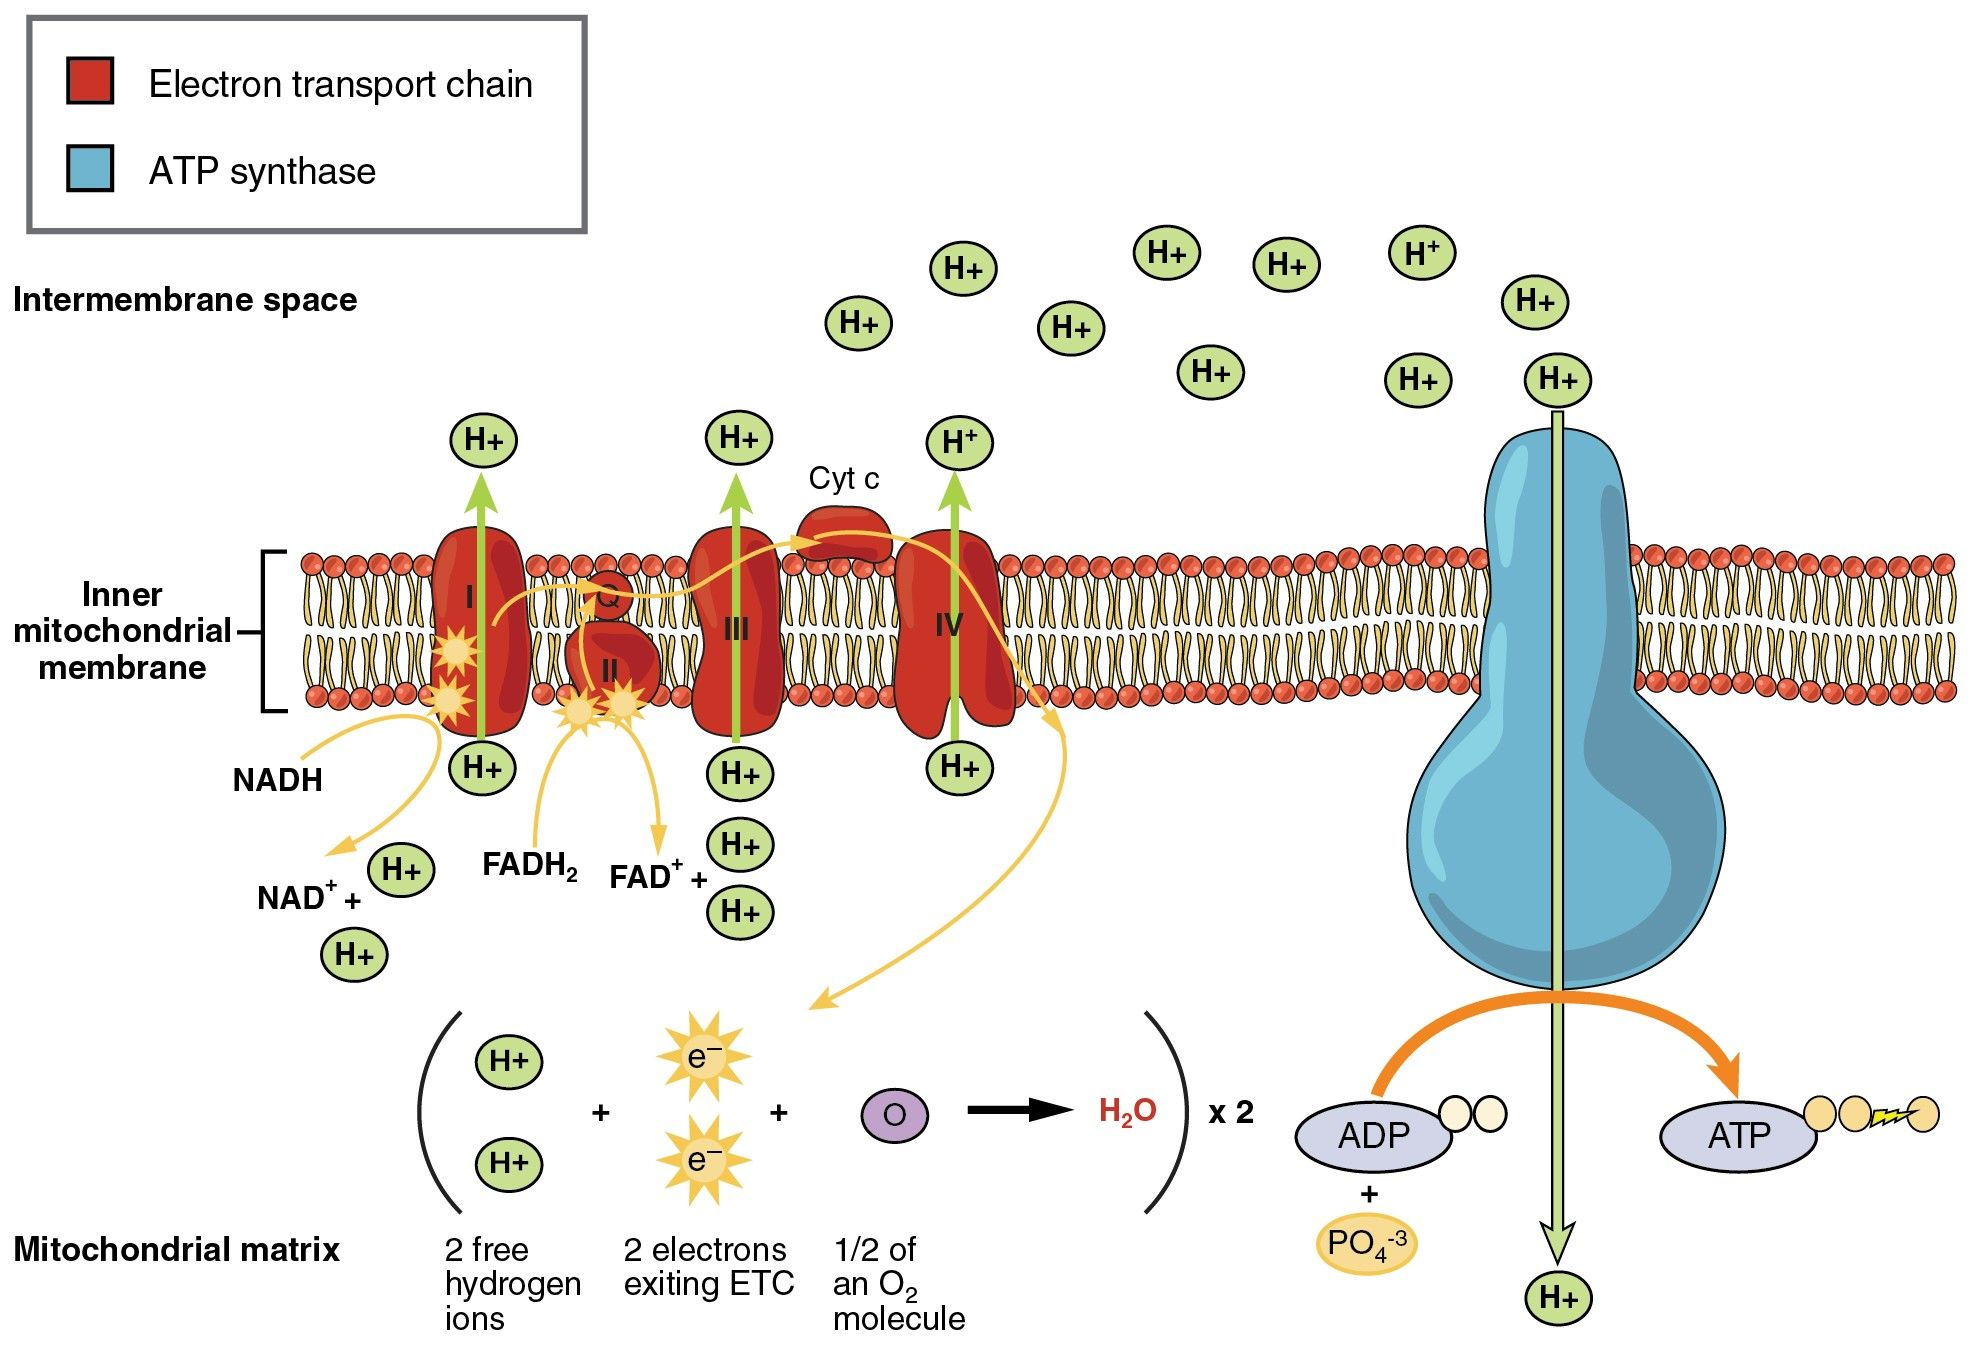 Idea by Sarah North on Biochem Electron transport chain